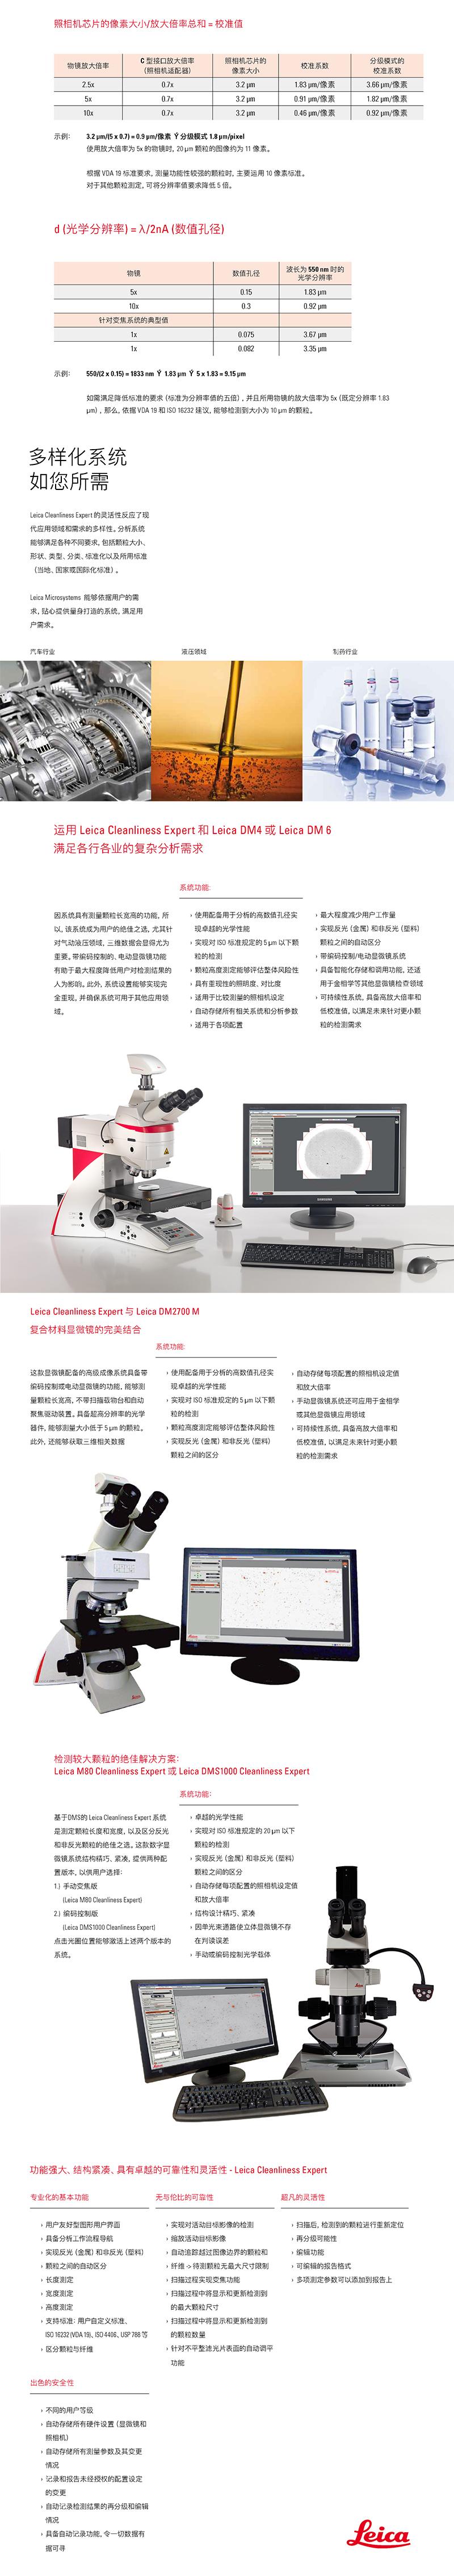 Leica Cleanliness Expert